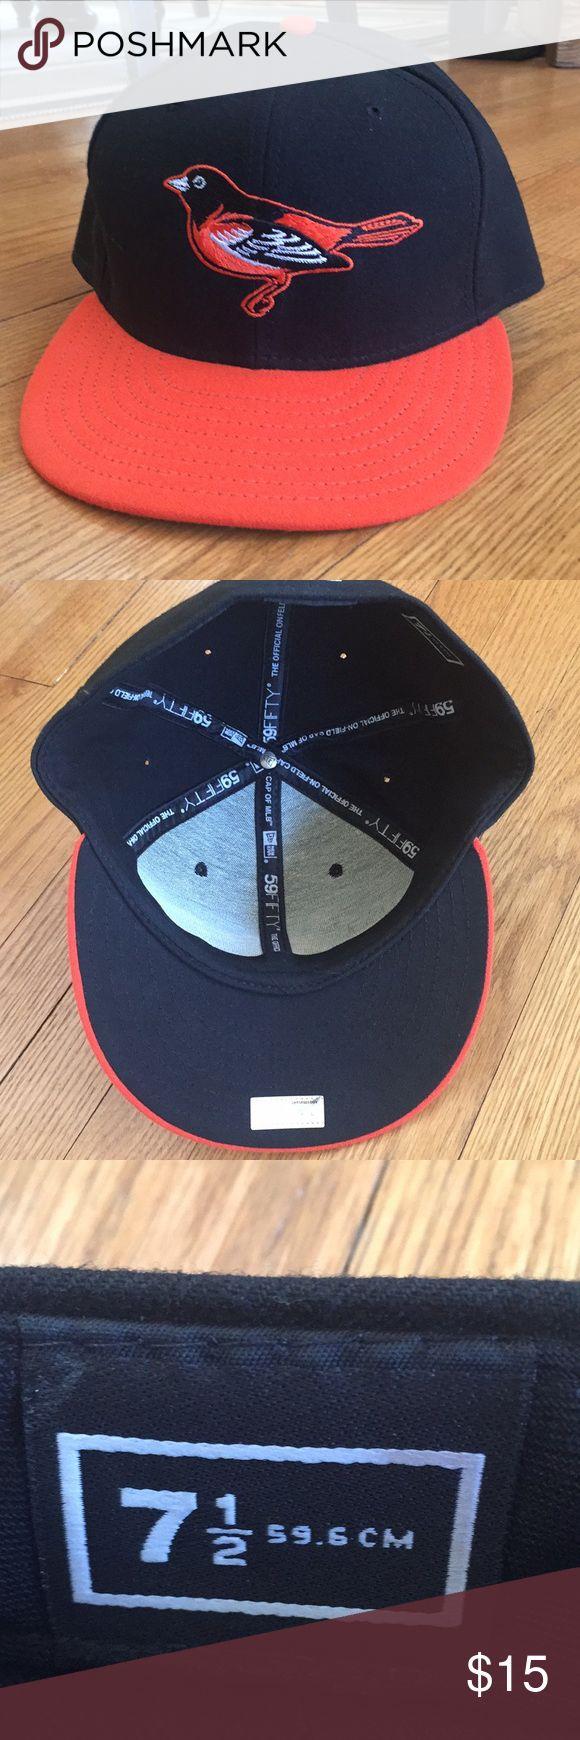 Authentic New Era Orioles cap.   🍁 Like new condition, New Era 59FIFTY cap, size 7 1/2, Baltimore Orioles New Era Accessories Hats